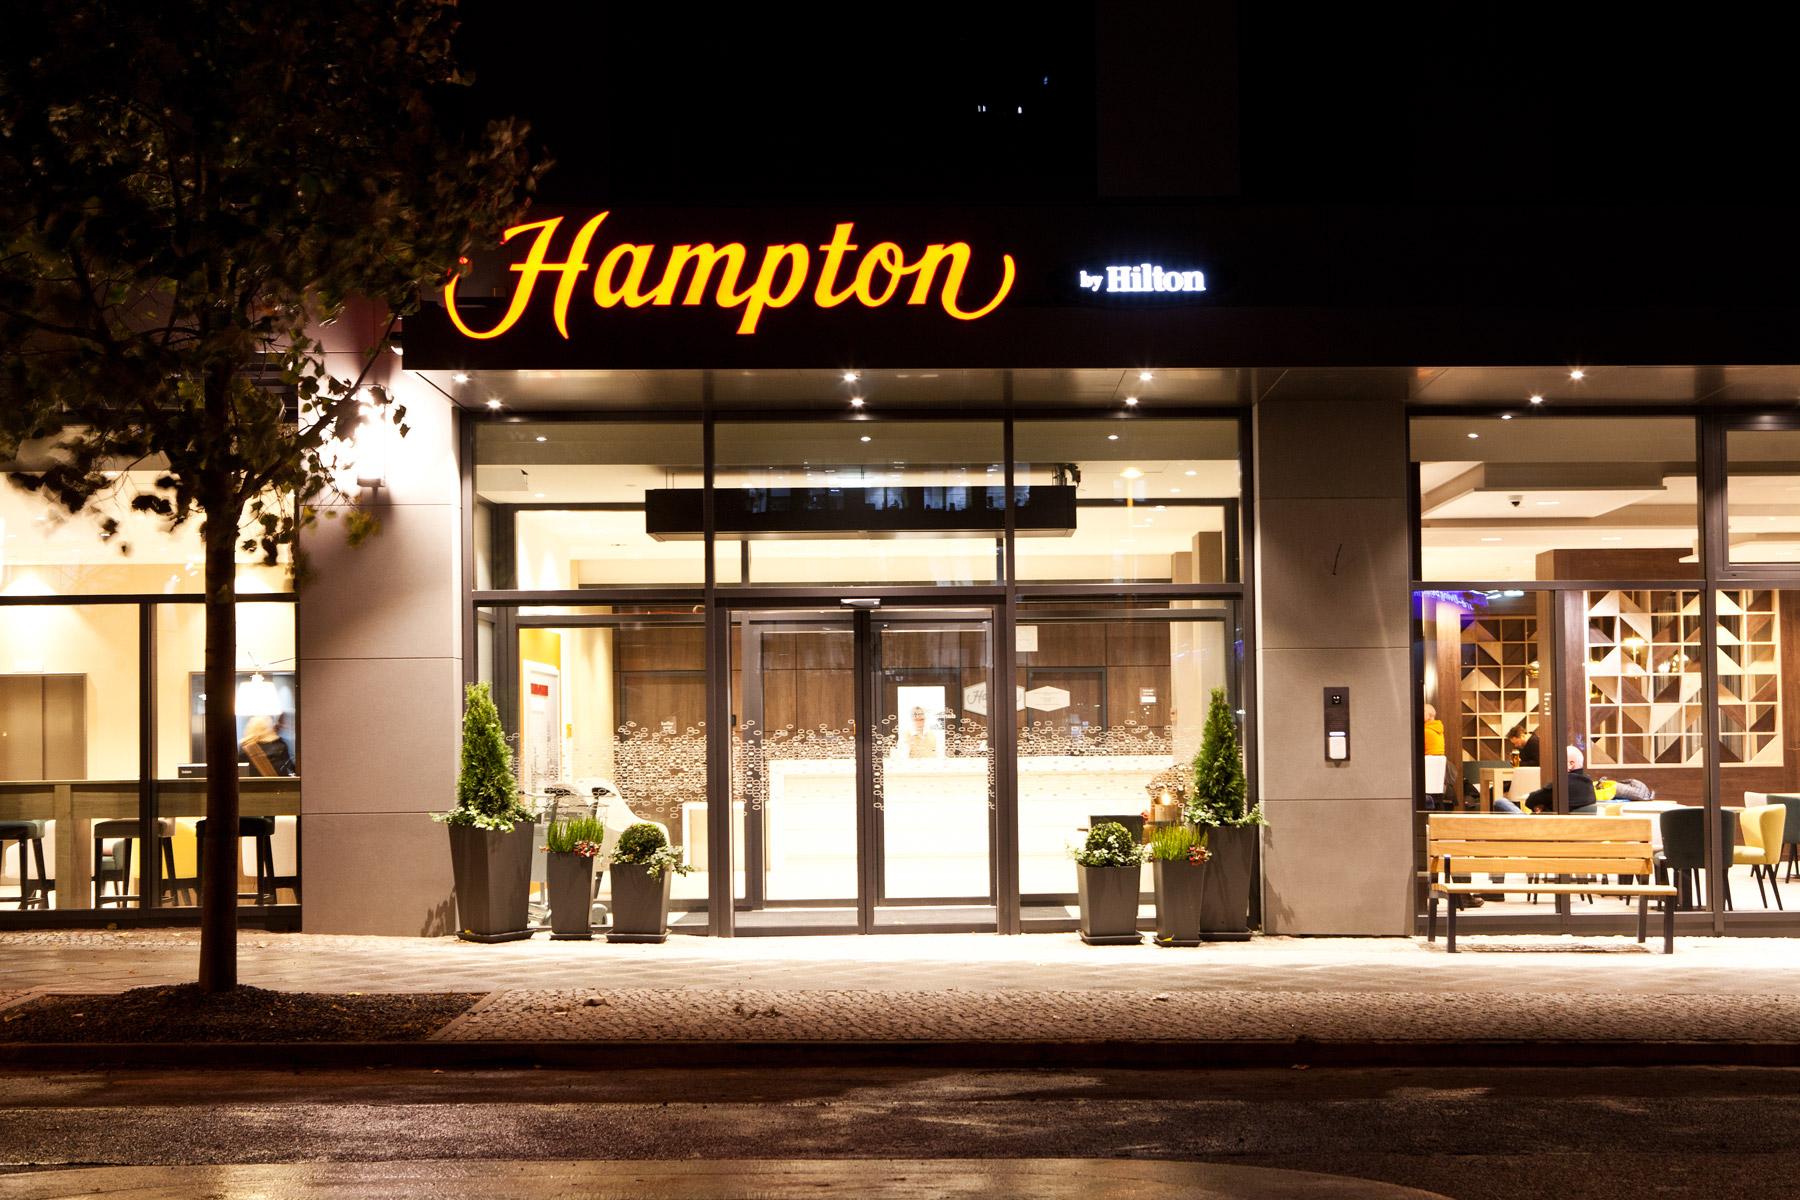 HamptonByHilton-Berlin_Exterior_Night1_web.jpg